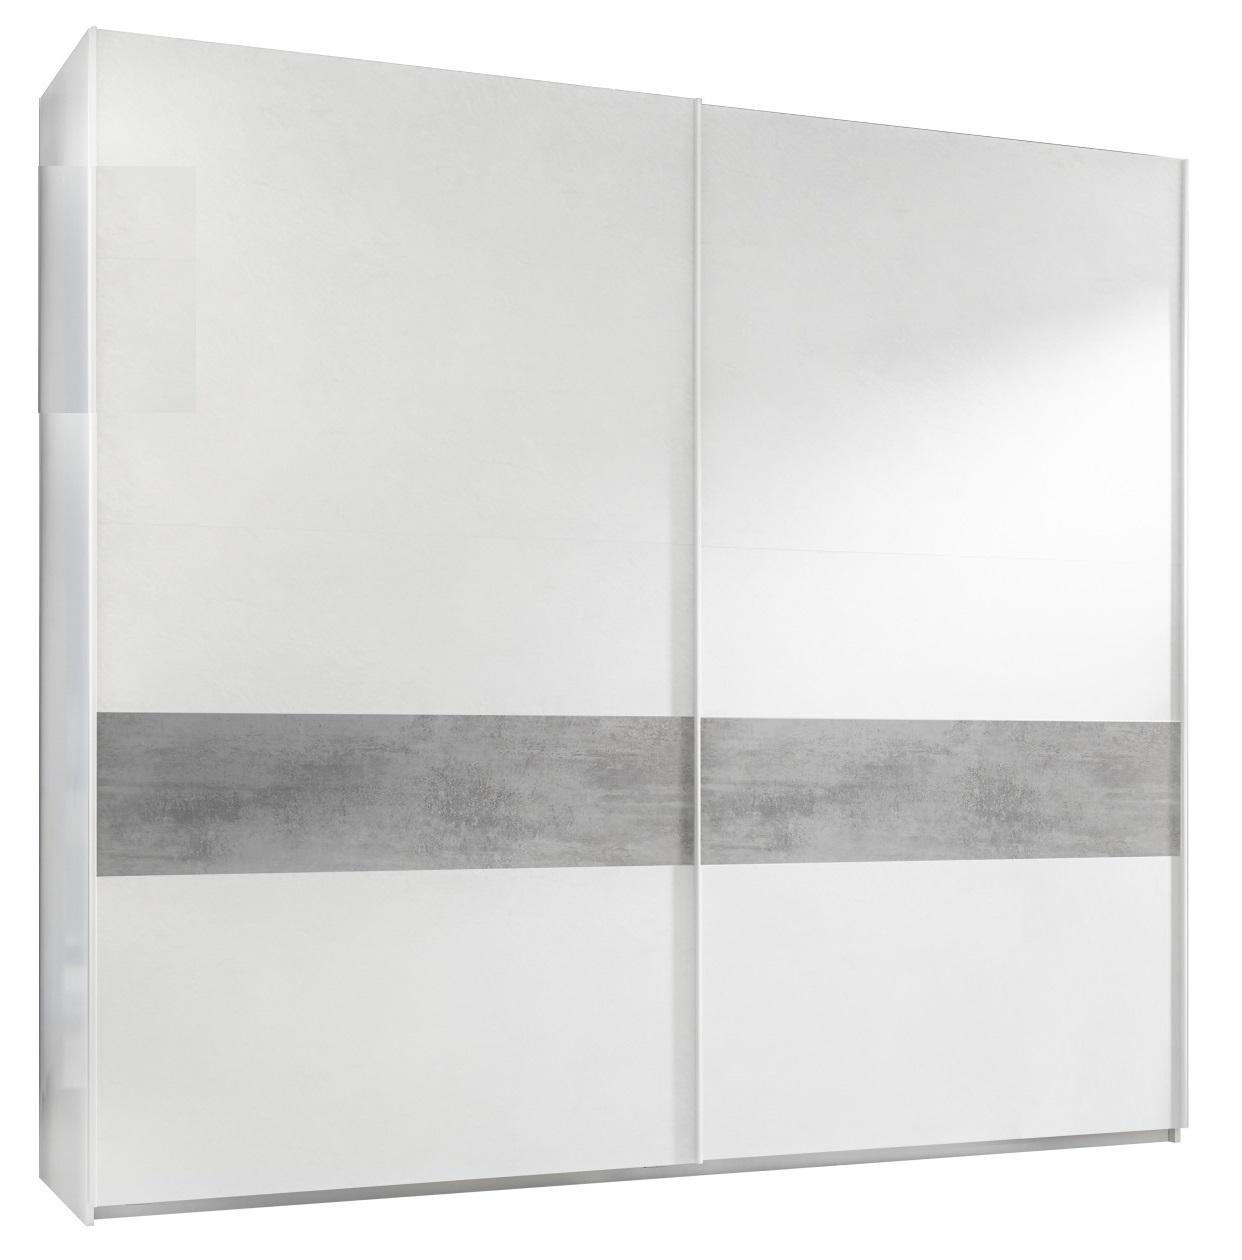 slaapkamerkast zweefdeurkast Amalti Alpaca 220 cm breed in mat wit met grijs beton